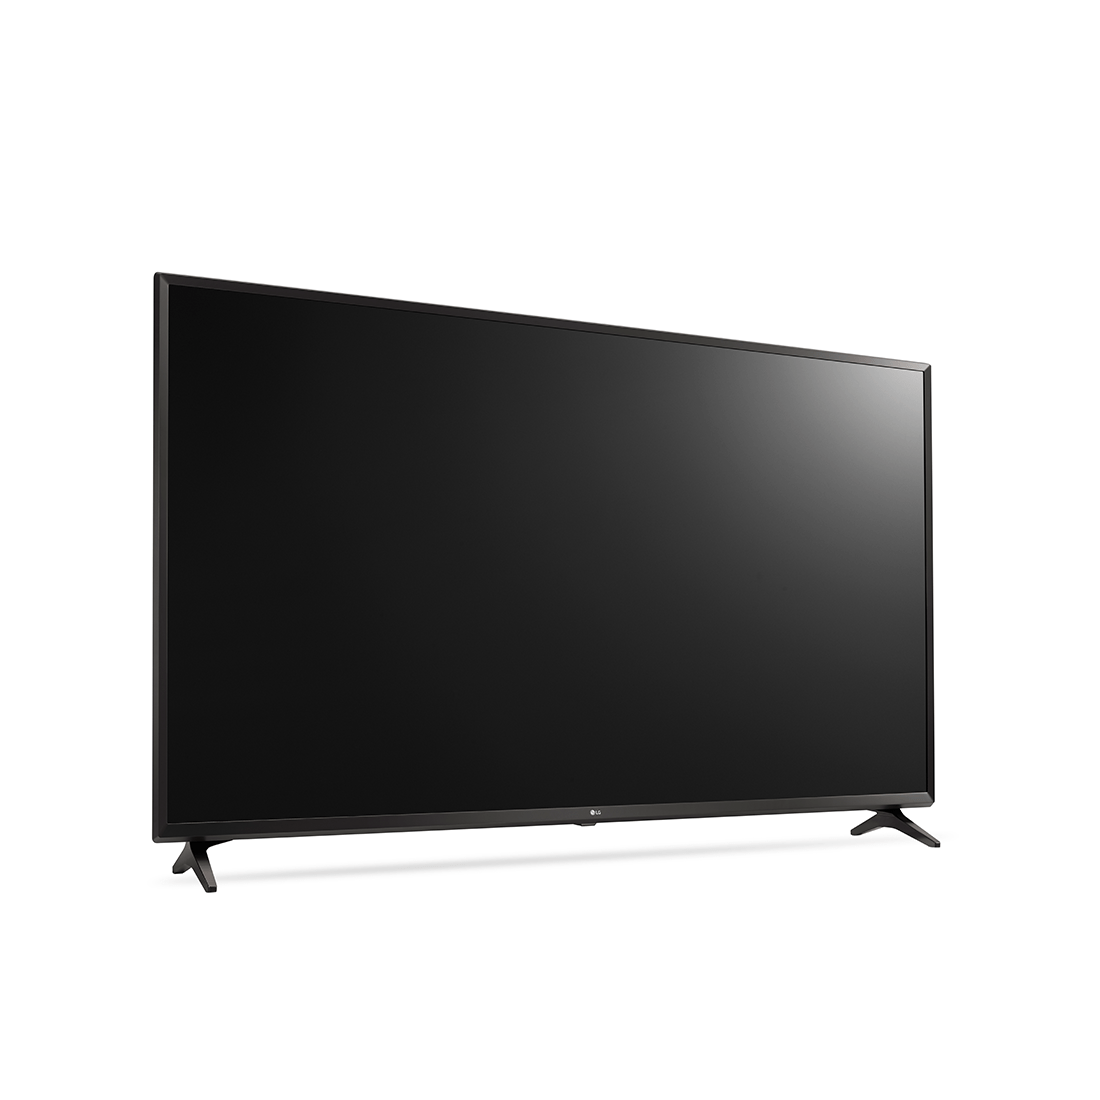 Lg 55uj6300 55 4k Uhd Hdr Smart Led Tv # Meuble Tv Home Cinema